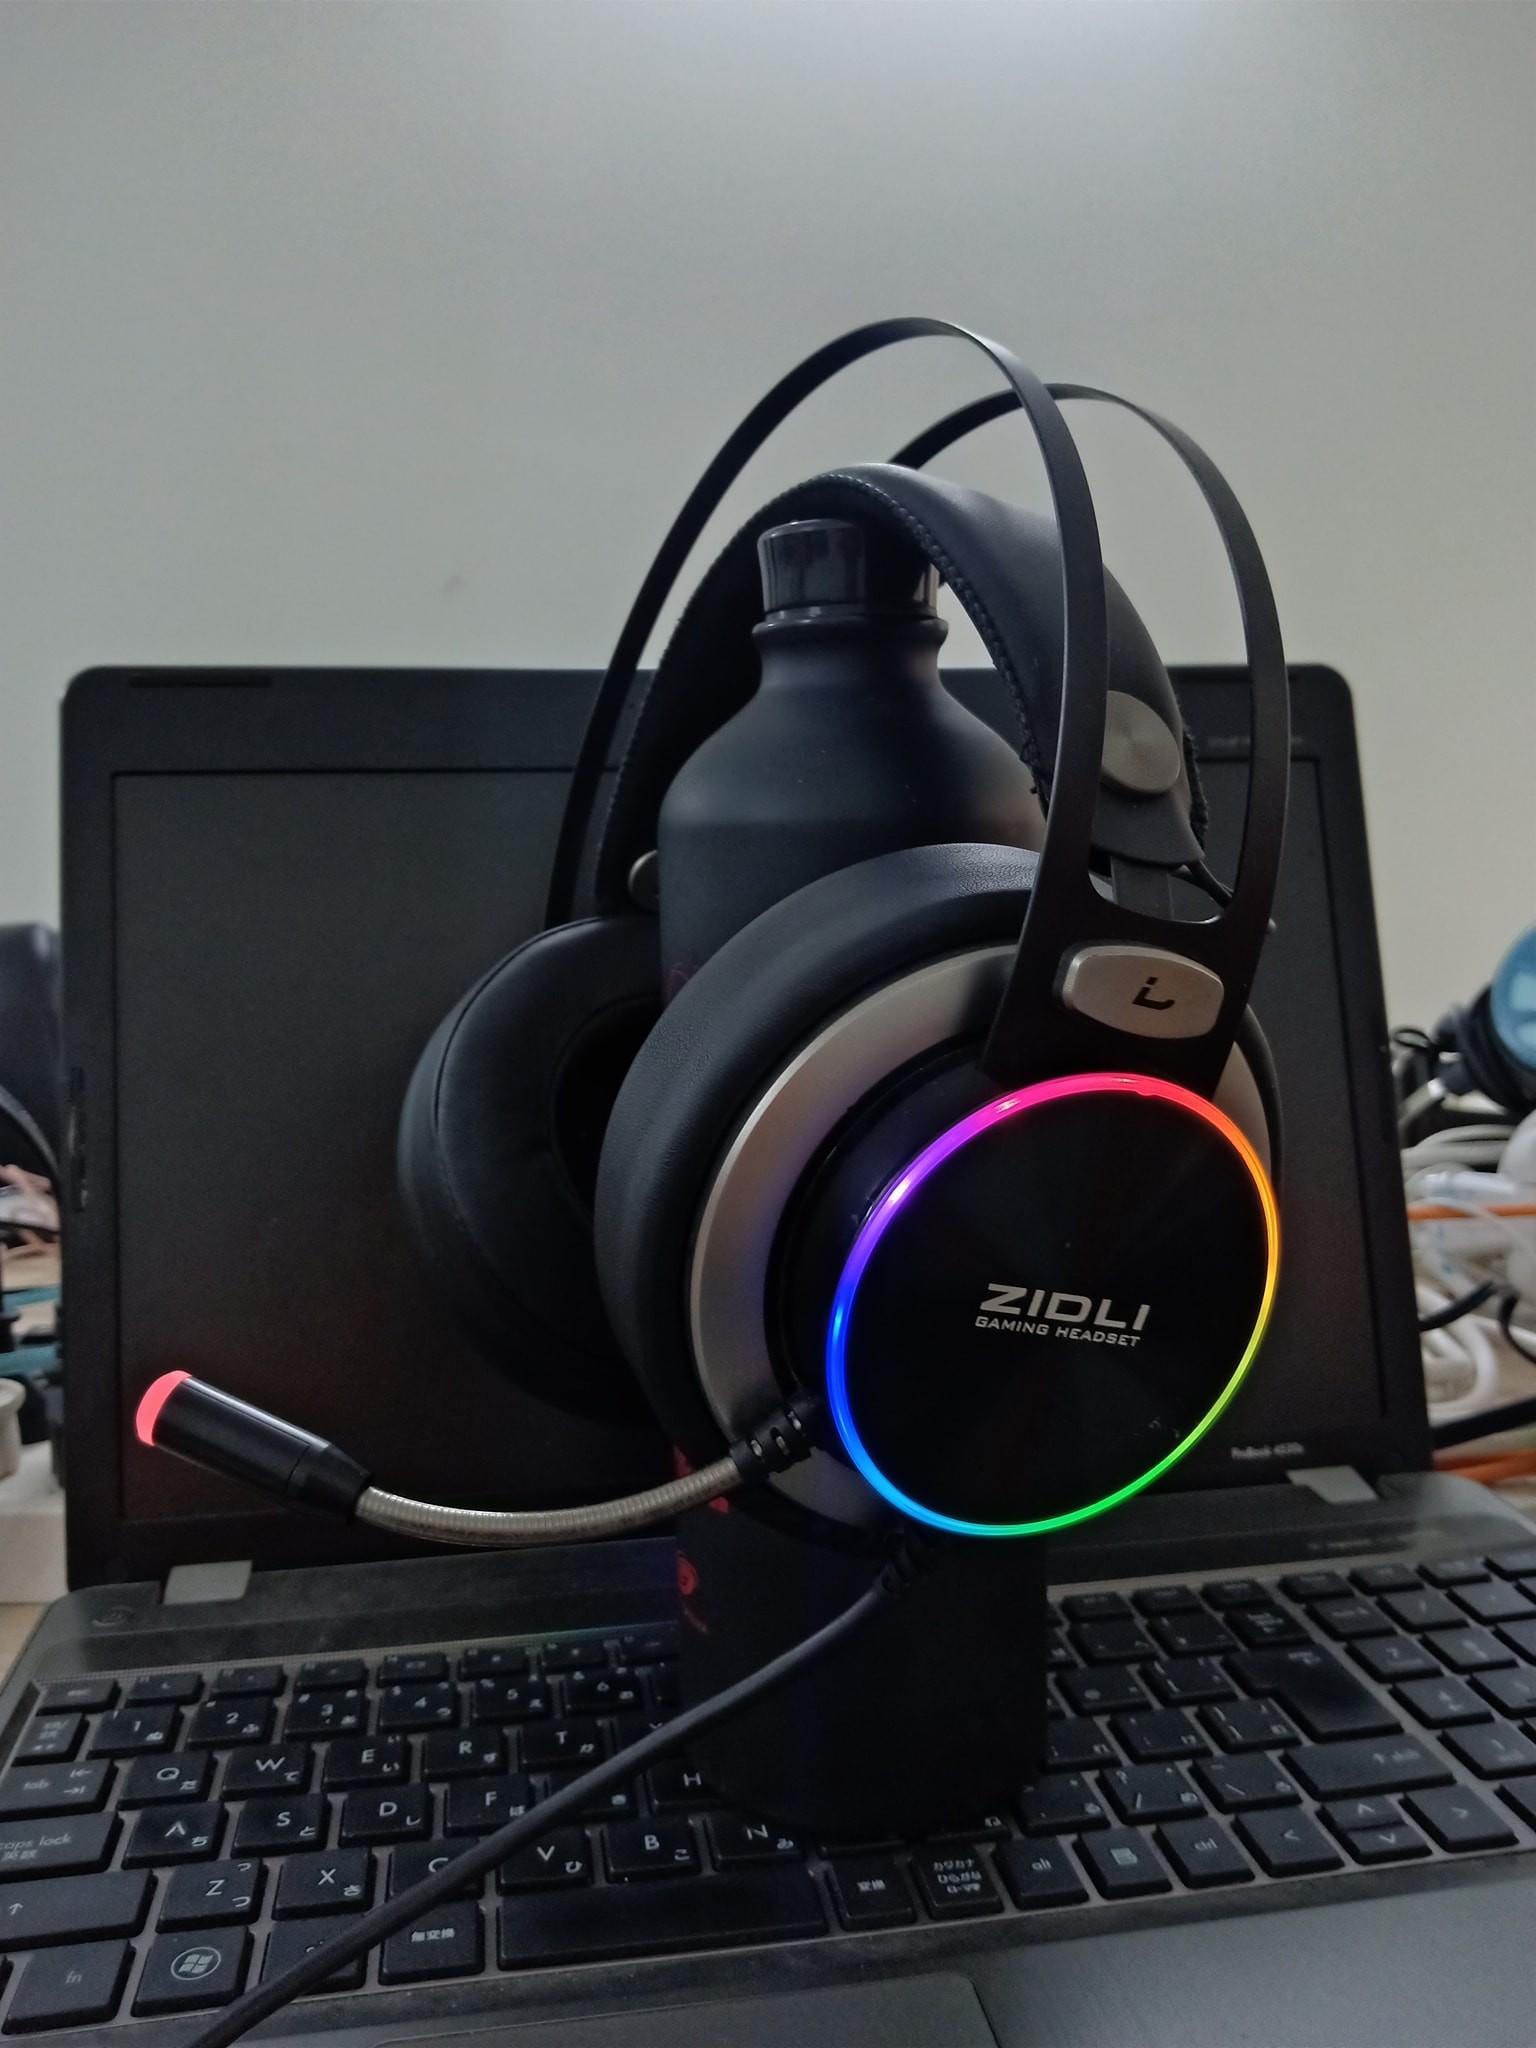 Zidli ZH20 7.1 RGB Gaming Headset